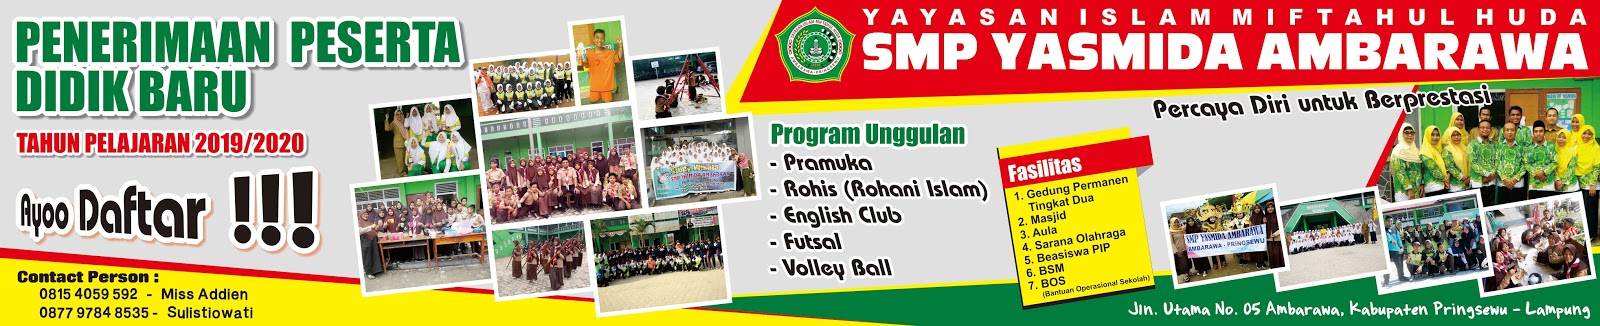 Desain Banner Spanduk Ppdb Smp Yasmida Ambarawa